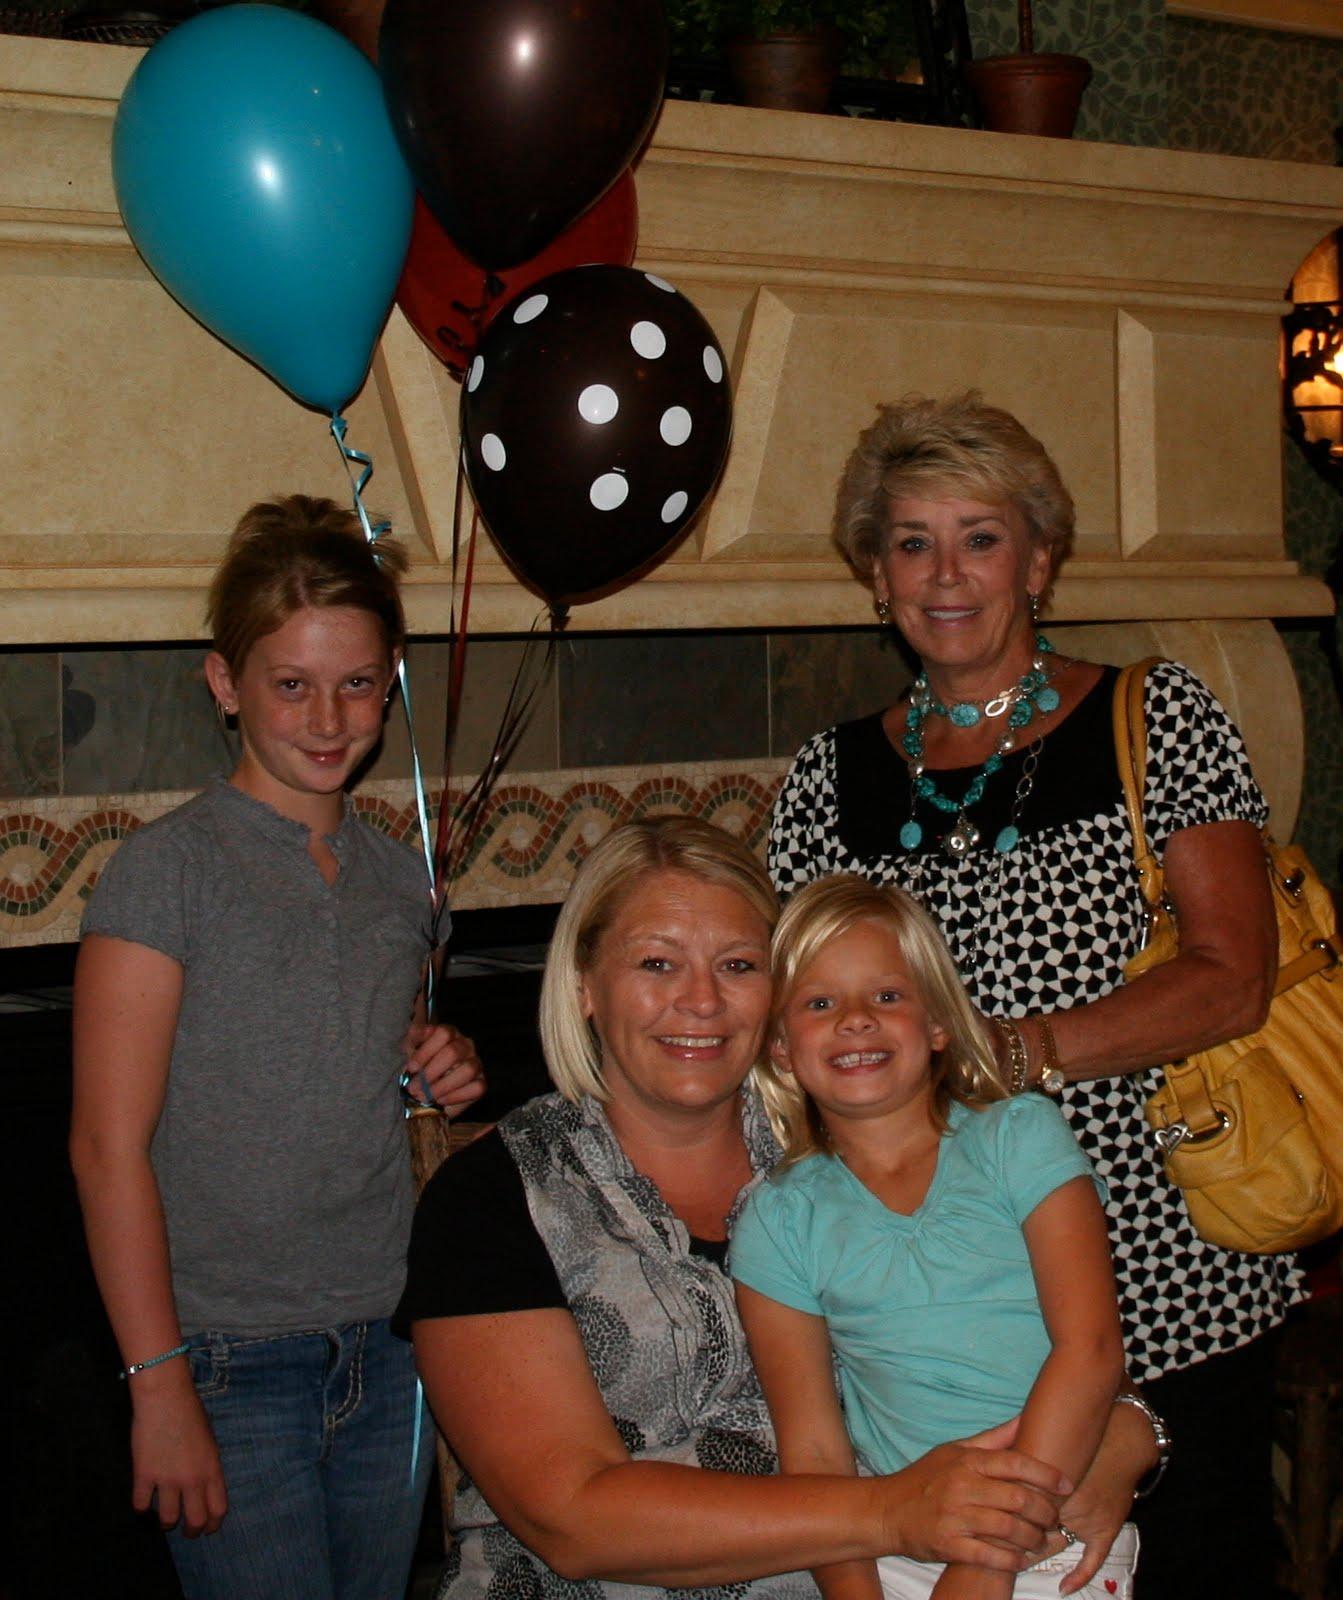 Kargis Family: Baby Showers